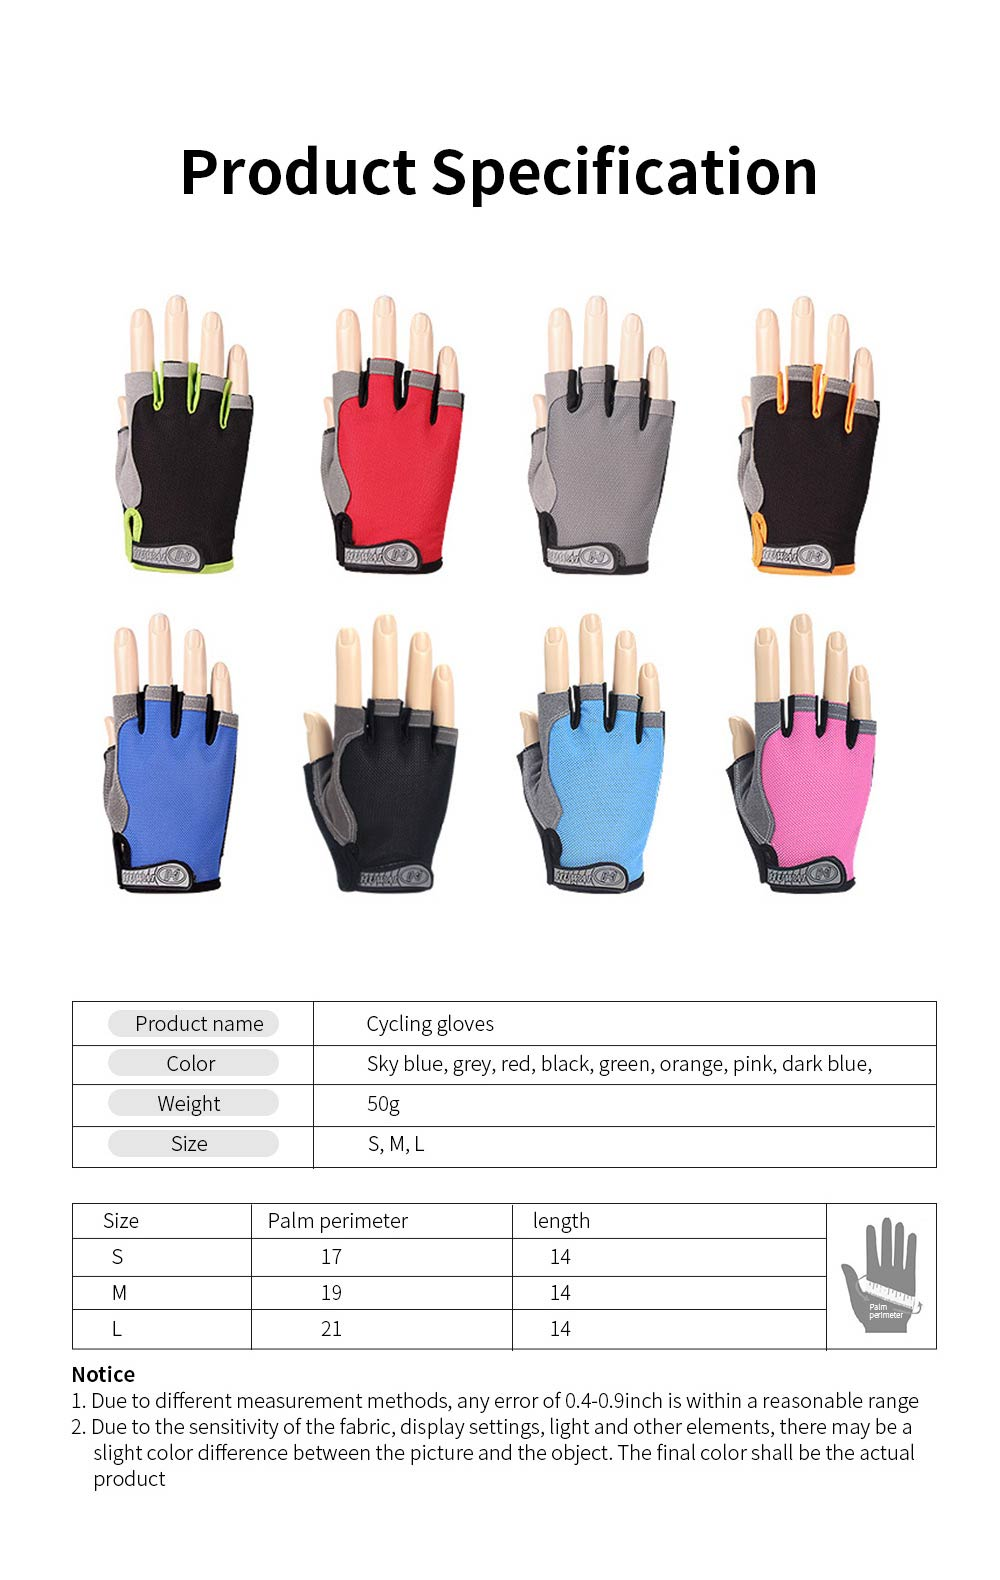 Cycling Gloves Half Finger Mesh Mountain Riding Gloves with Lightweight Anti-Slip Shock-Absorbing Biking Gloves for Men and Women 6